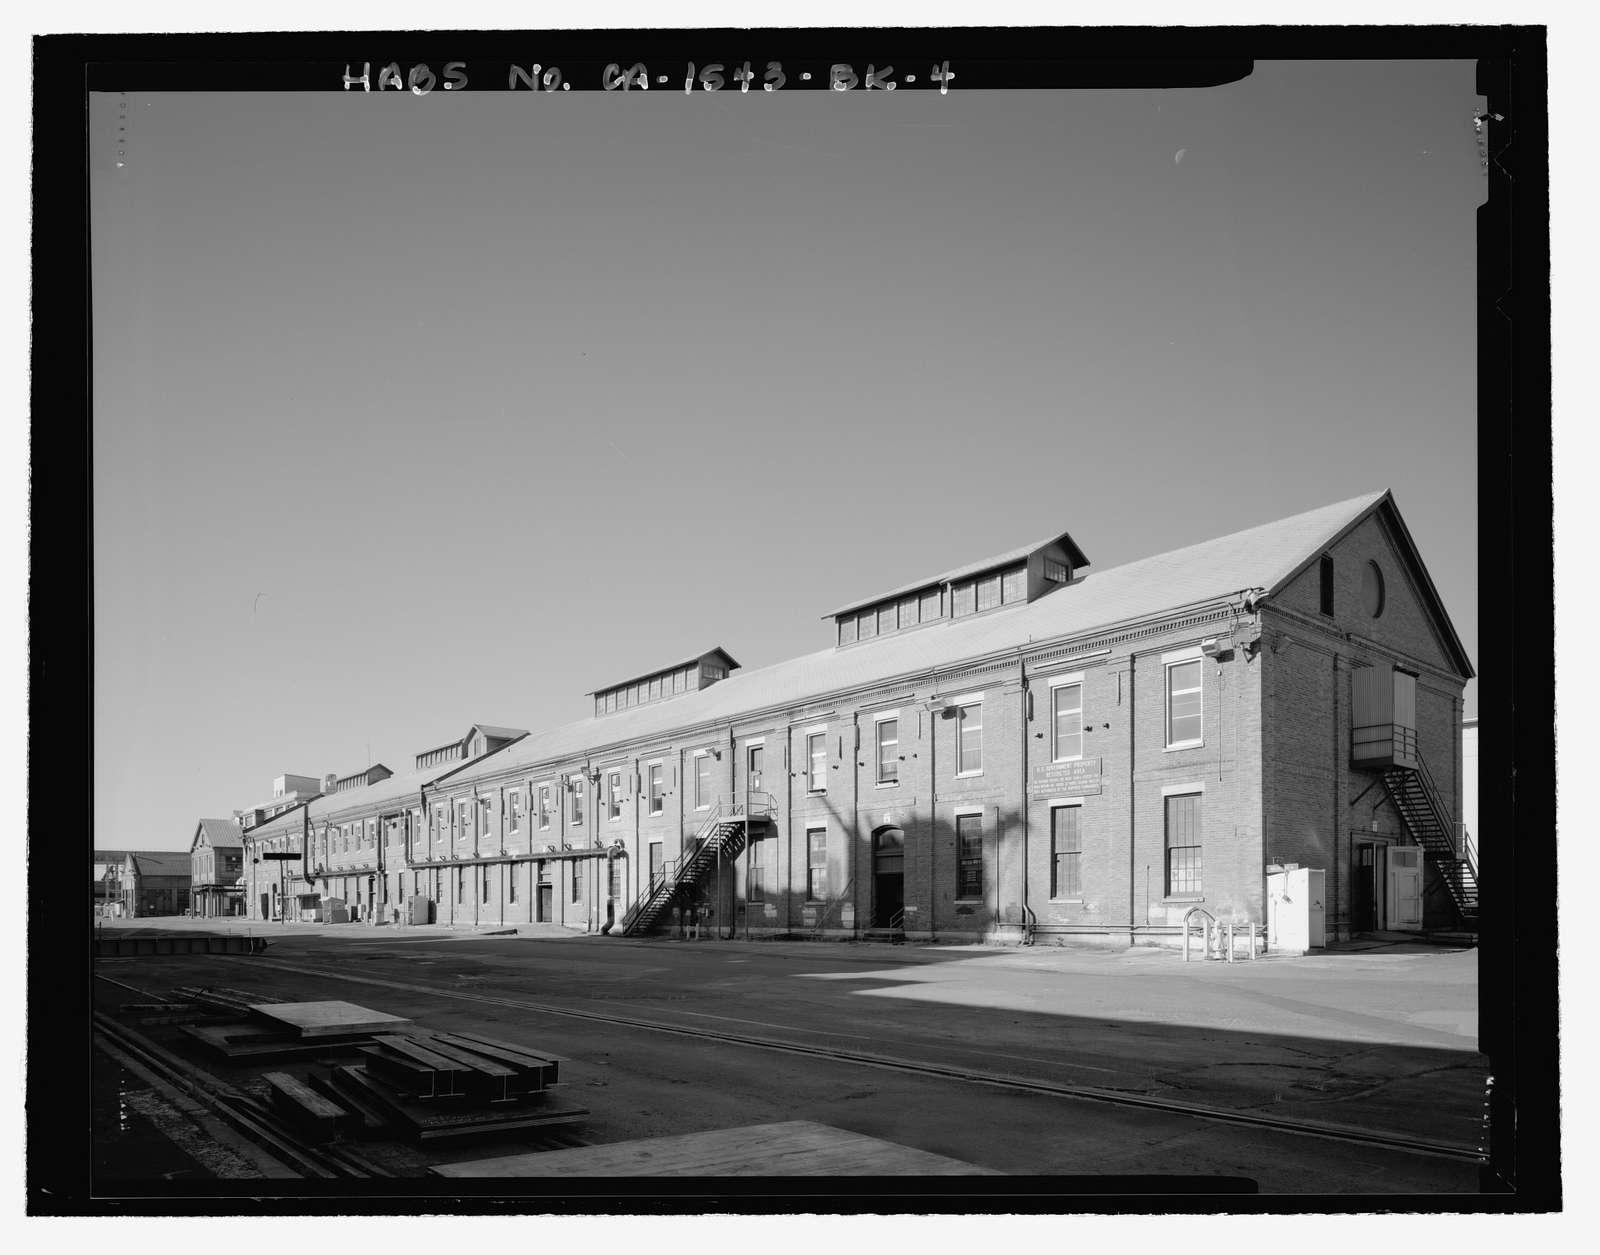 Mare Island Naval Shipyard, Equipment & Recruitment Storehouse, Waterfront Avenue, northwest corner of Waterfront Avenue & Fifth Street, Vallejo, Solano County, CA